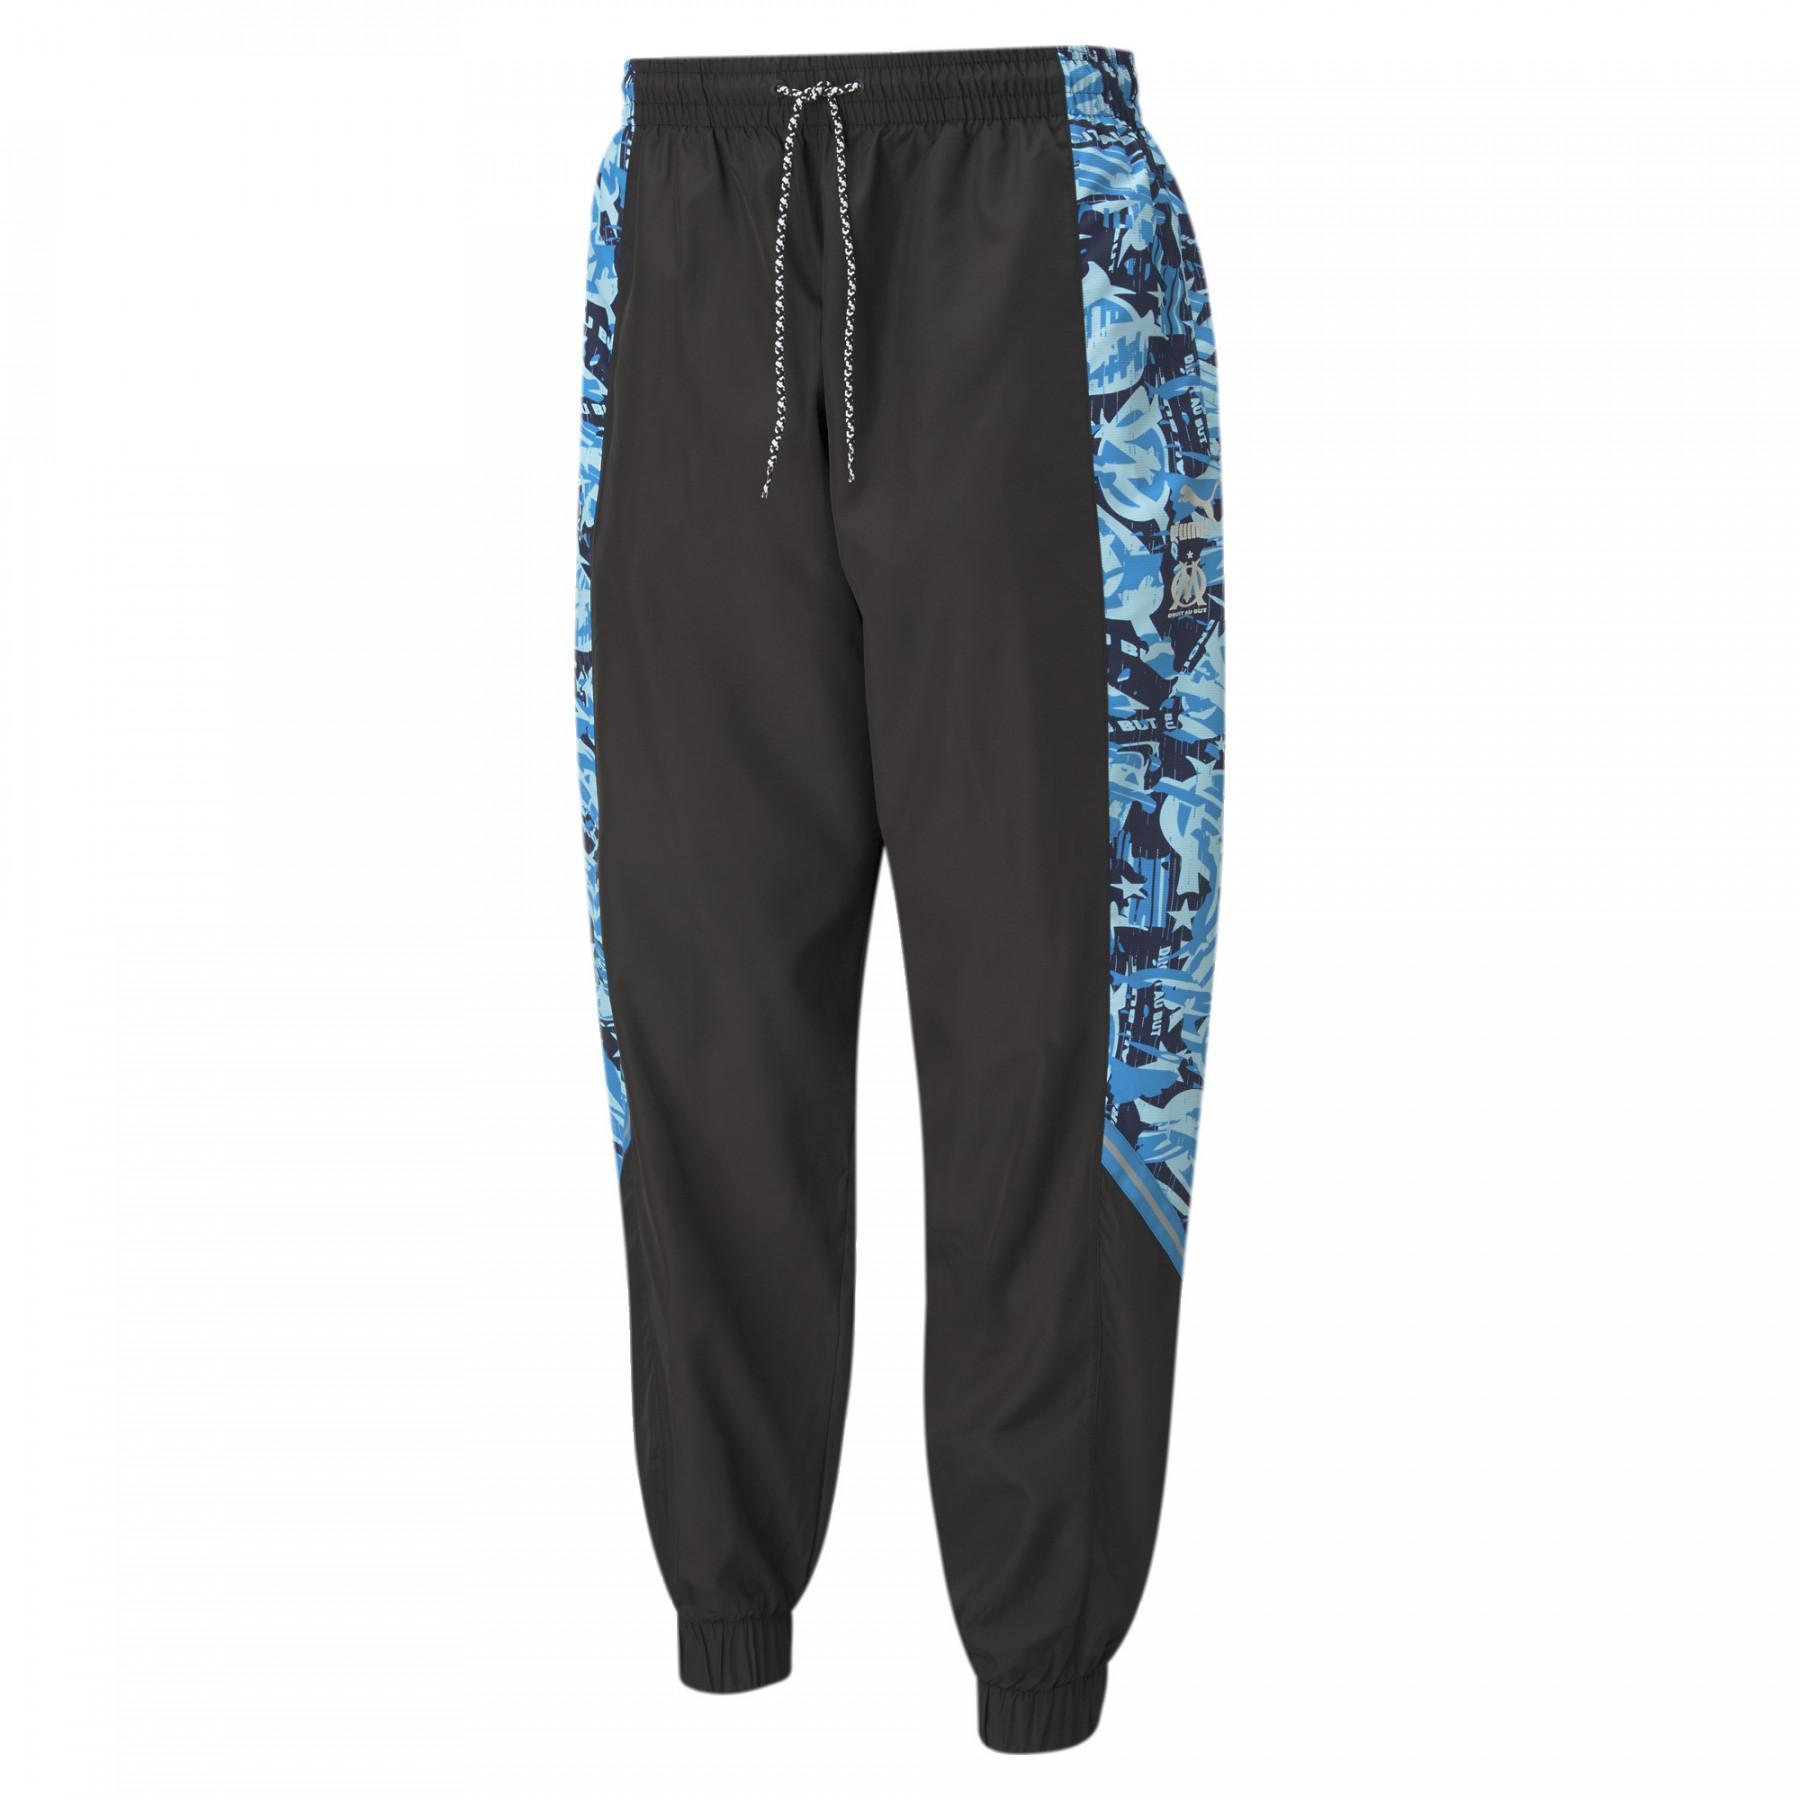 Pantaloni OM TFS woven